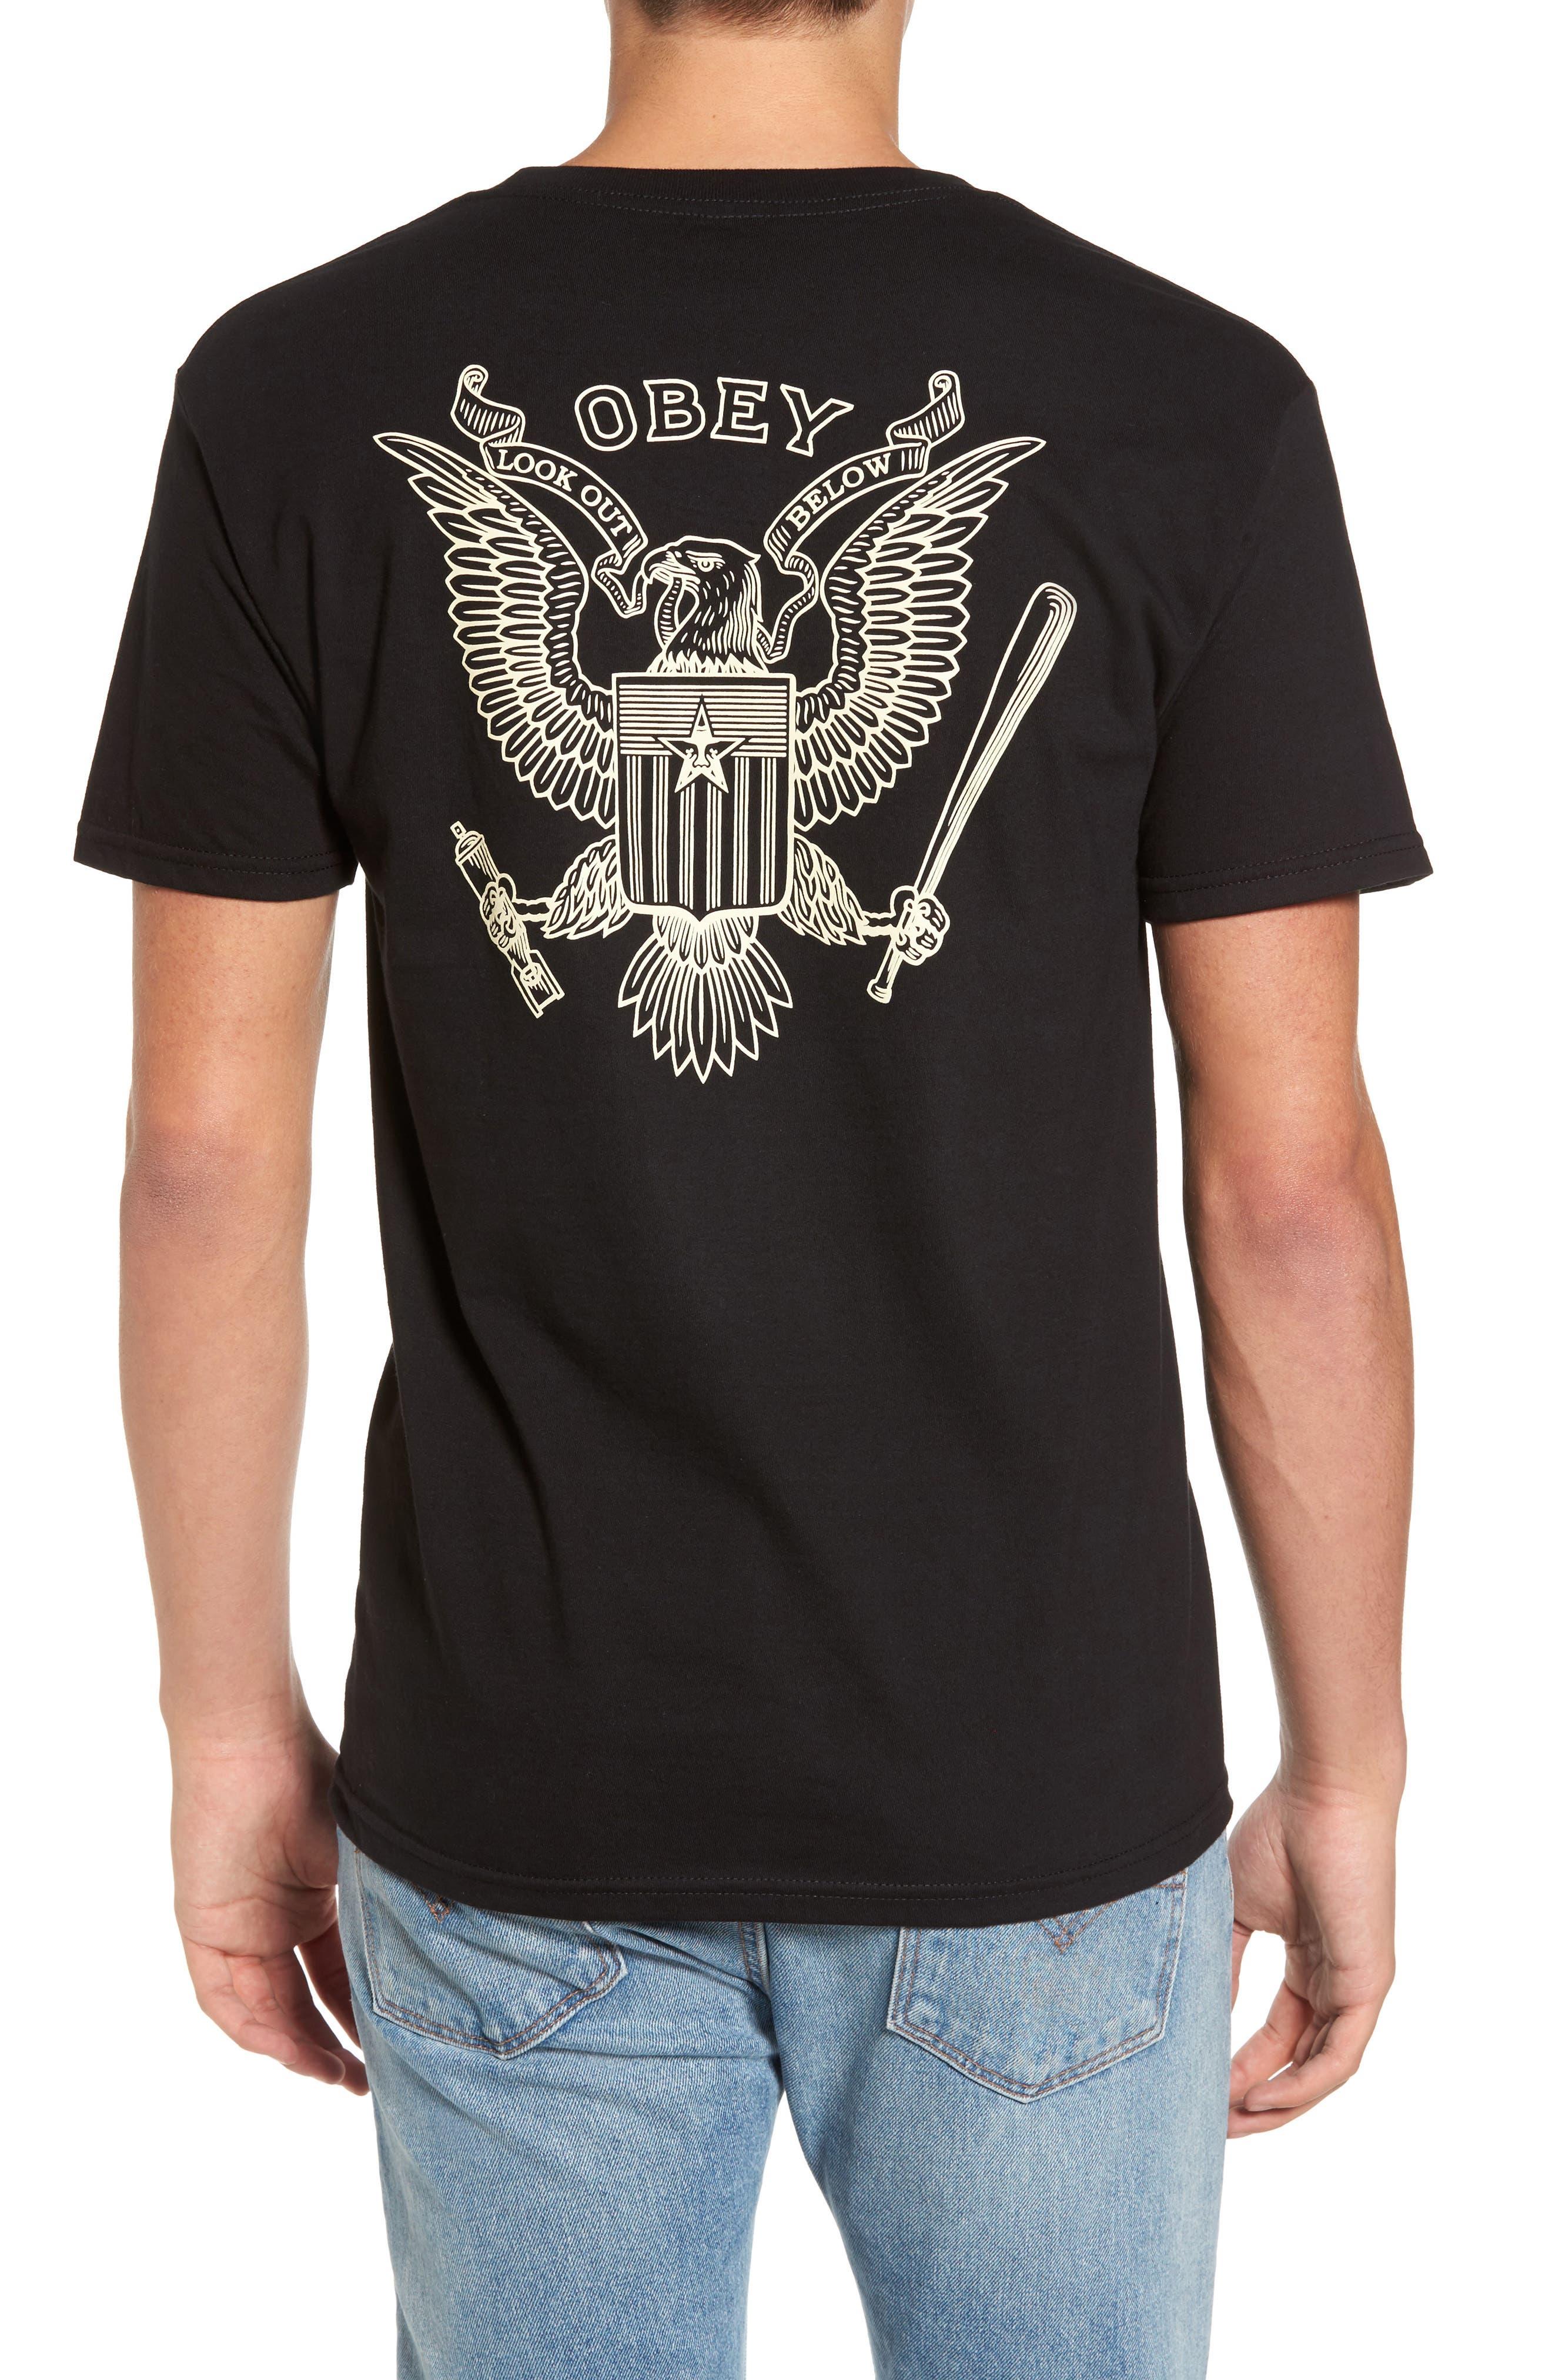 Look Out Below Premium Graphic T-Shirt,                             Alternate thumbnail 2, color,                             Black